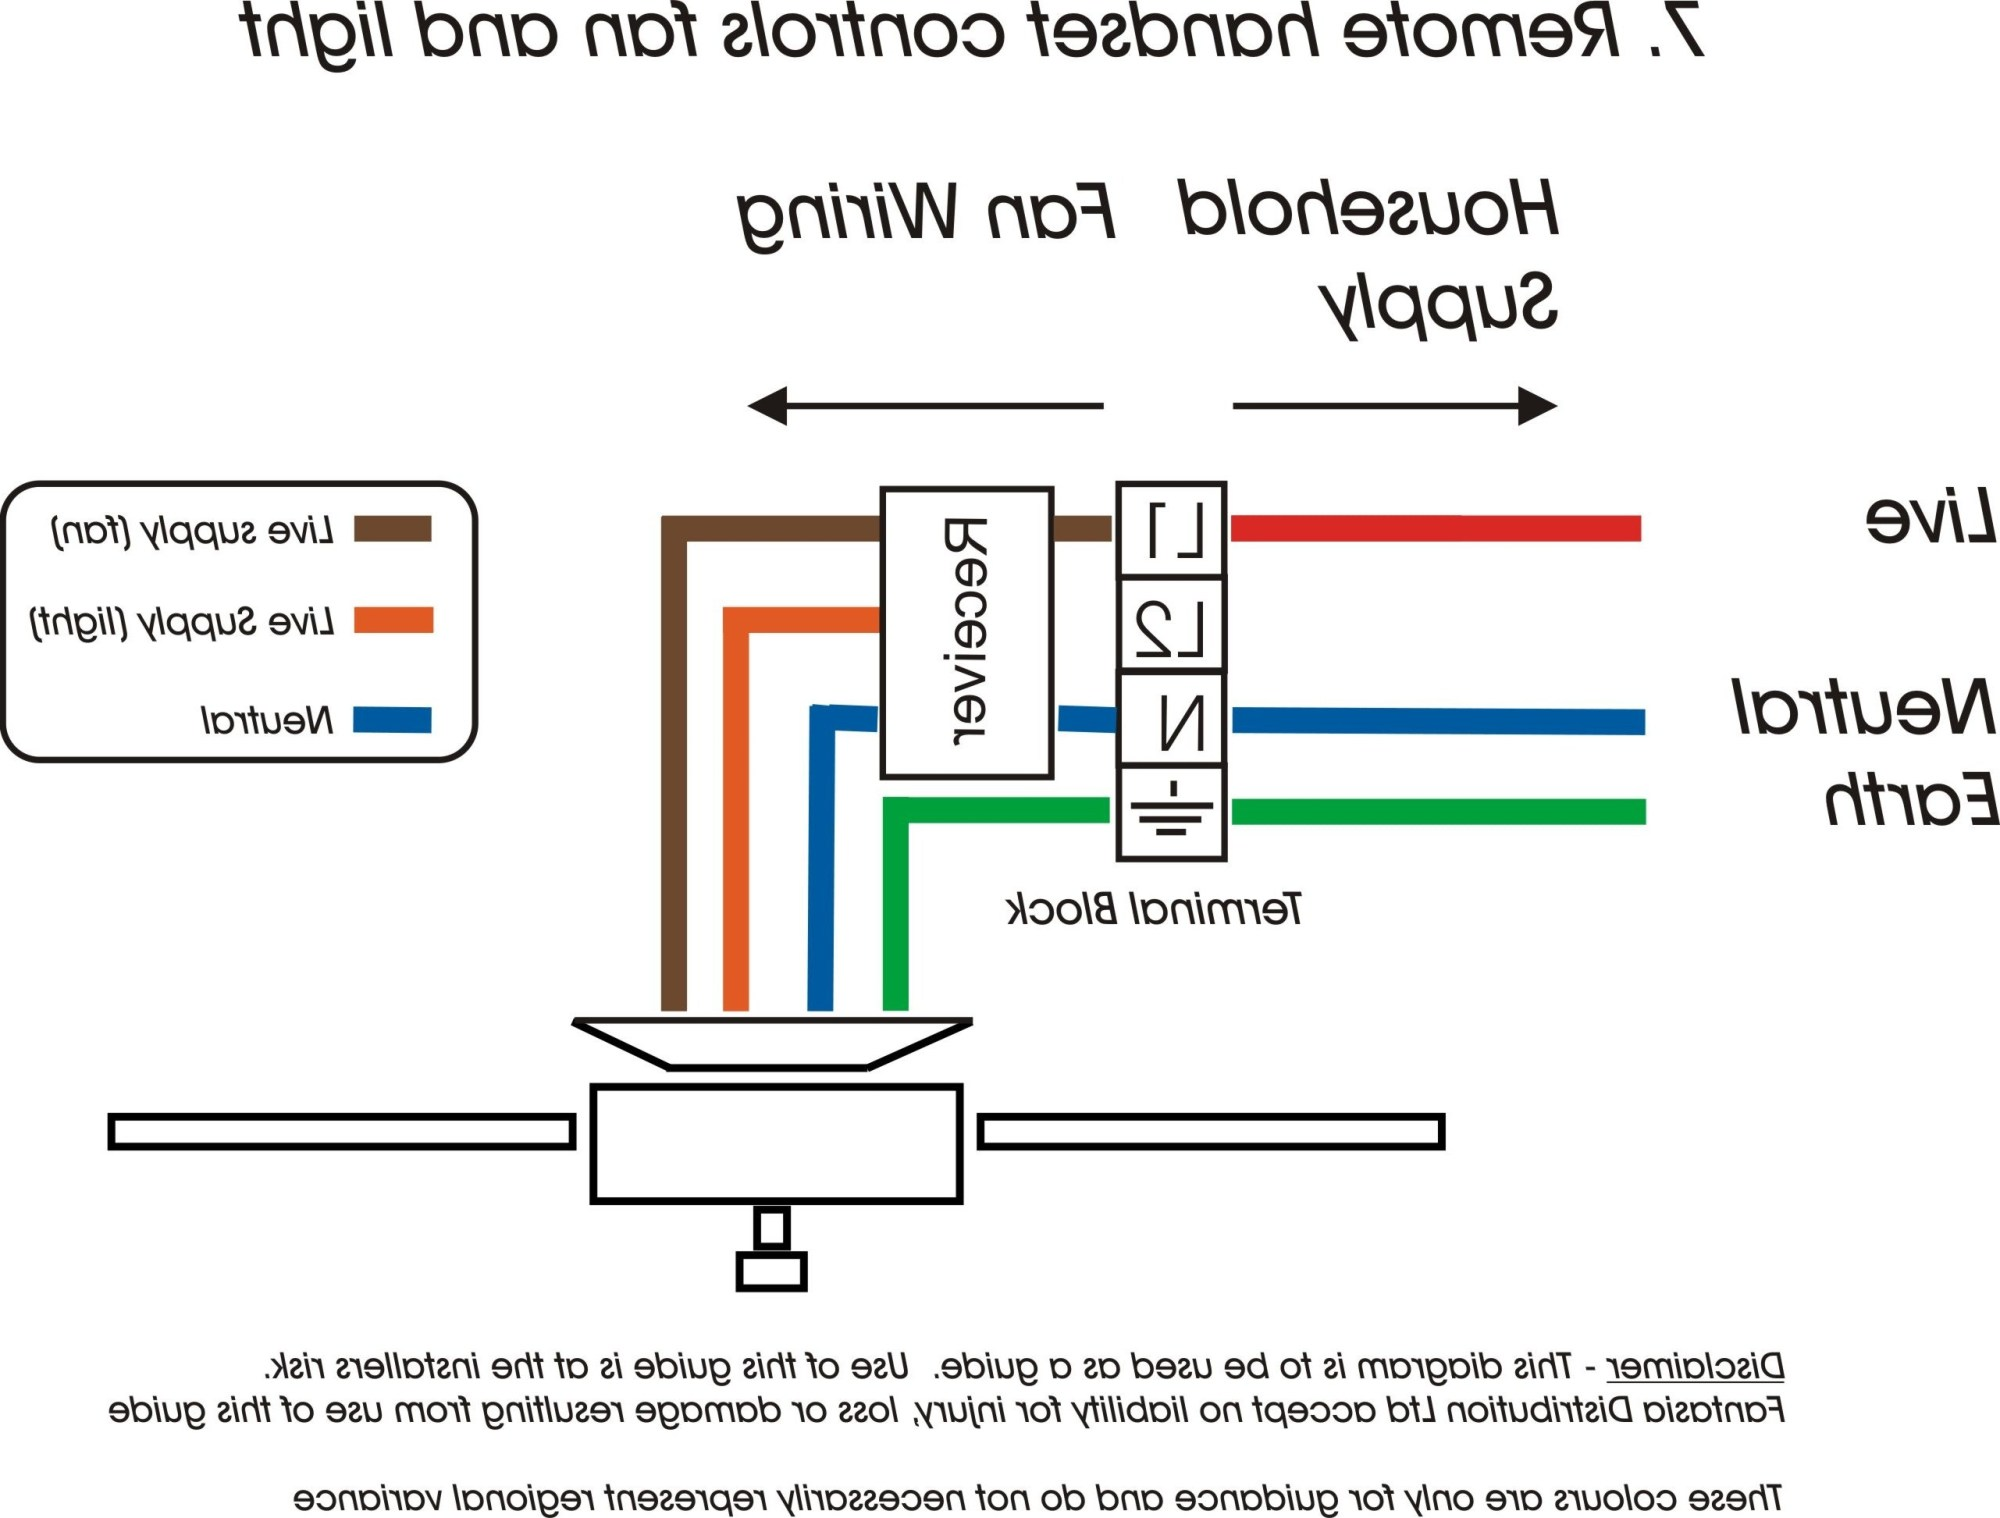 hight resolution of sprinkler system wiring diagram collection low voltage lighting wiring diagram 9 k download wiring diagram images detail name sprinkler system